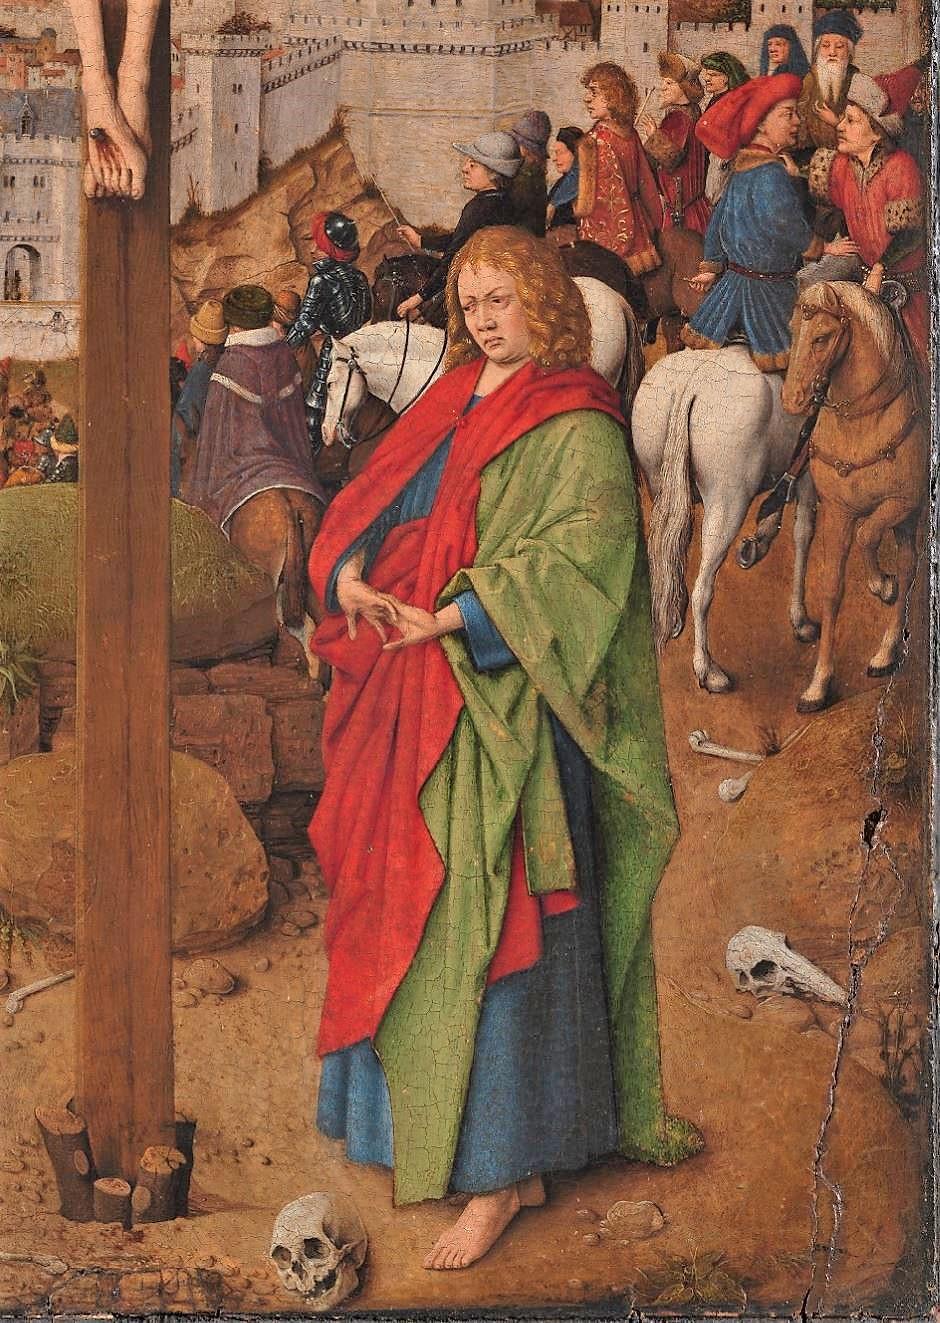 Van Eyck atelier 1440-50 Crucifixion Ca d'oro Venise detail Ct Jean